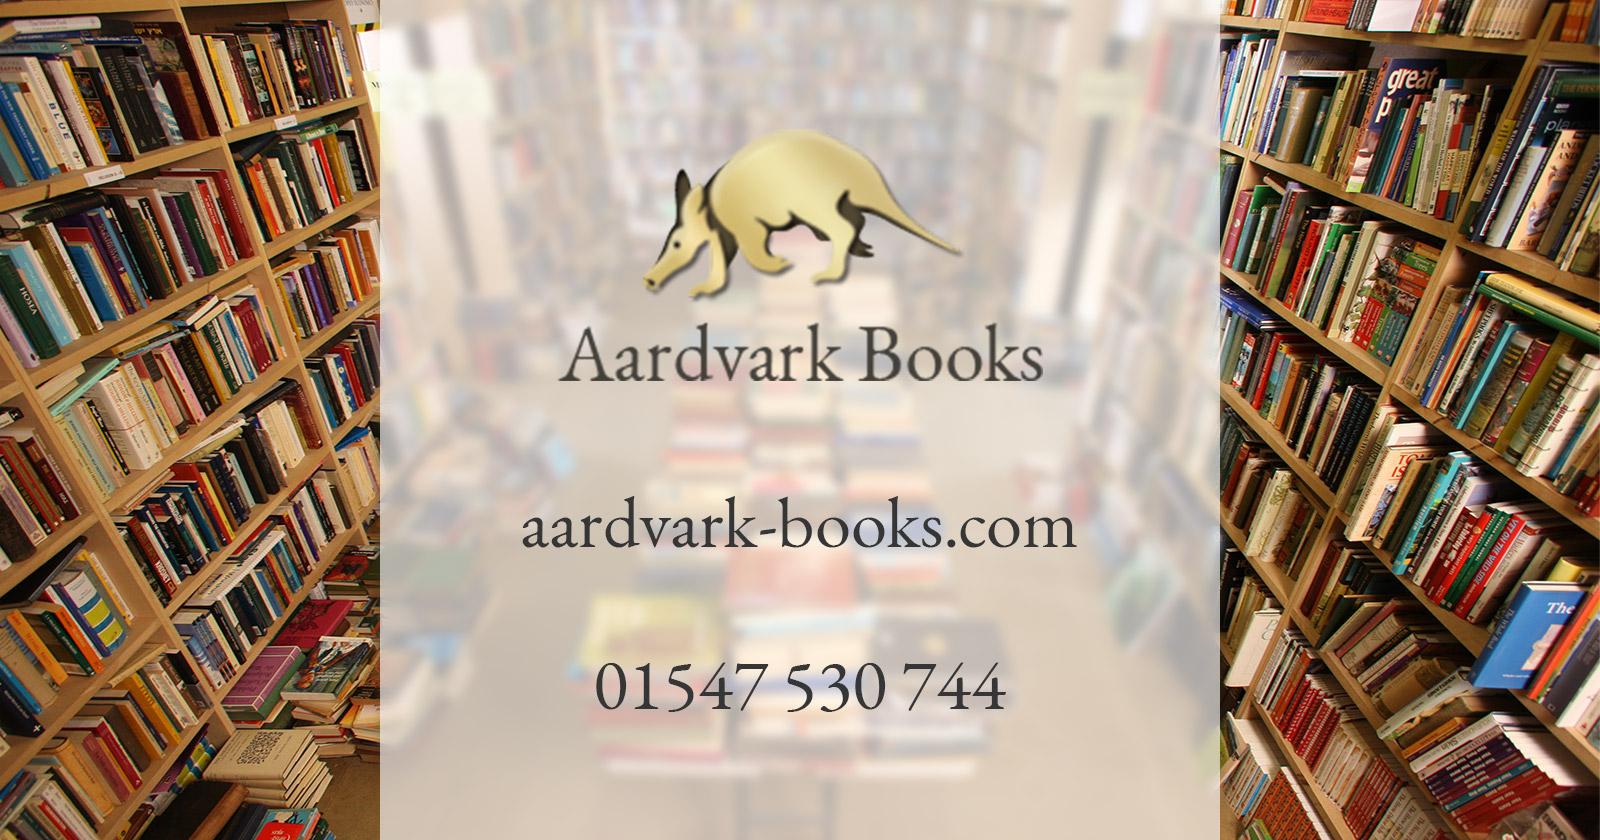 Aardvark Books - Books, events and a Cafe